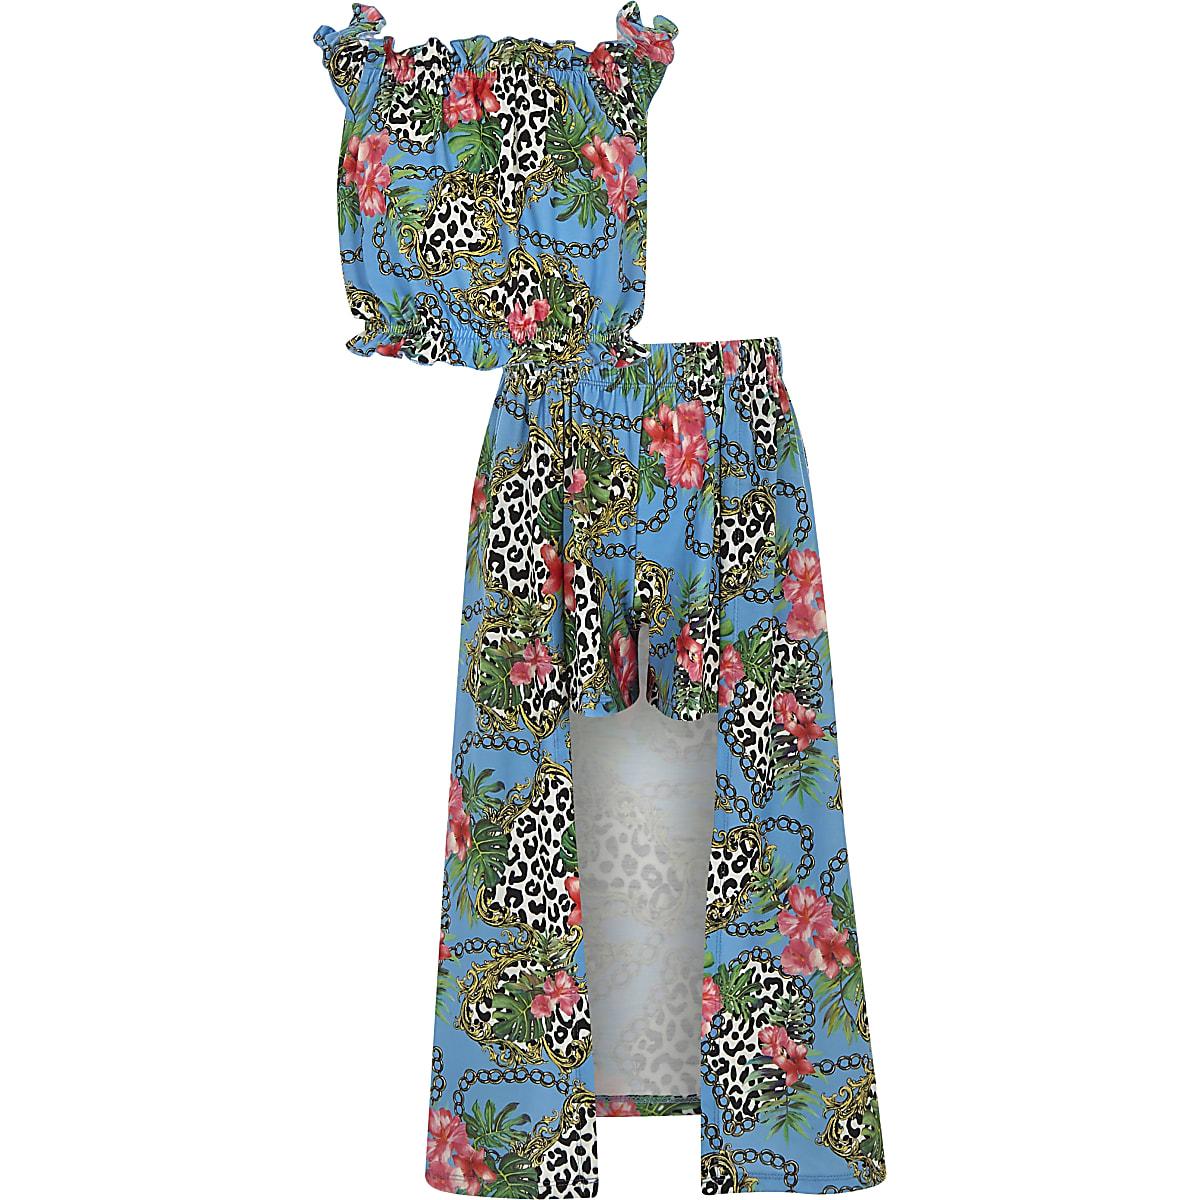 Girls blue chain print maxi skort outfit